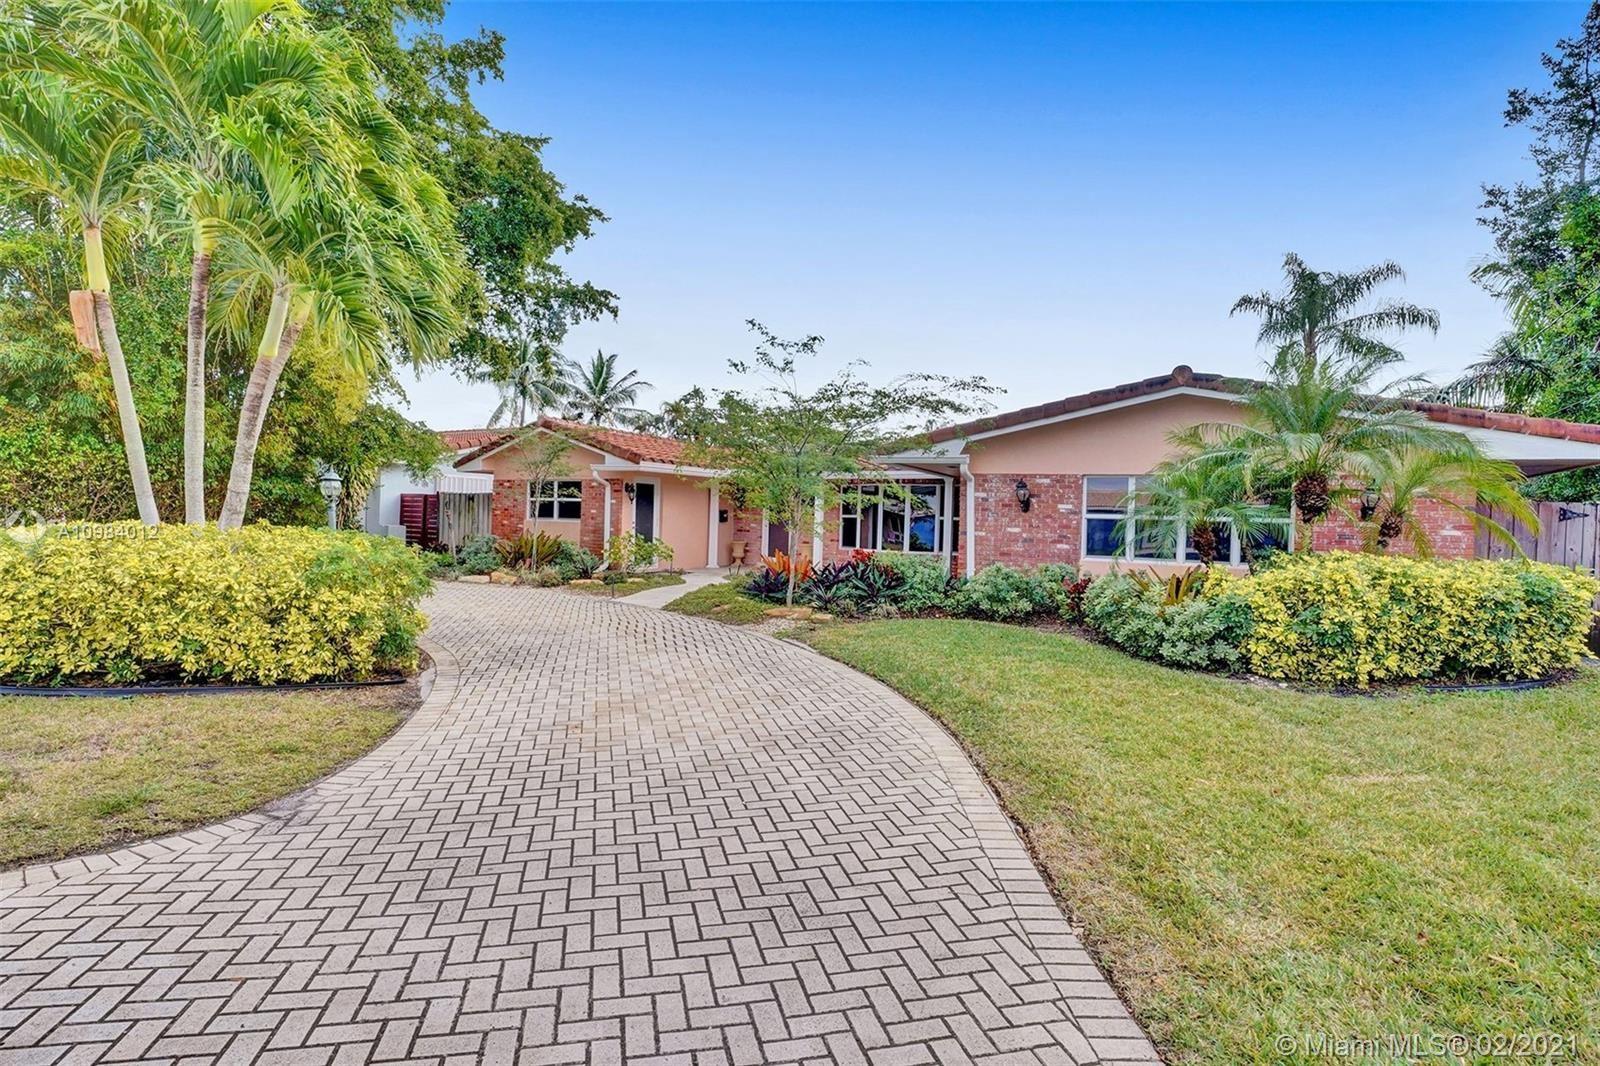 1448 NE 57th St, Fort Lauderdale, FL 33334 - #: A10984012